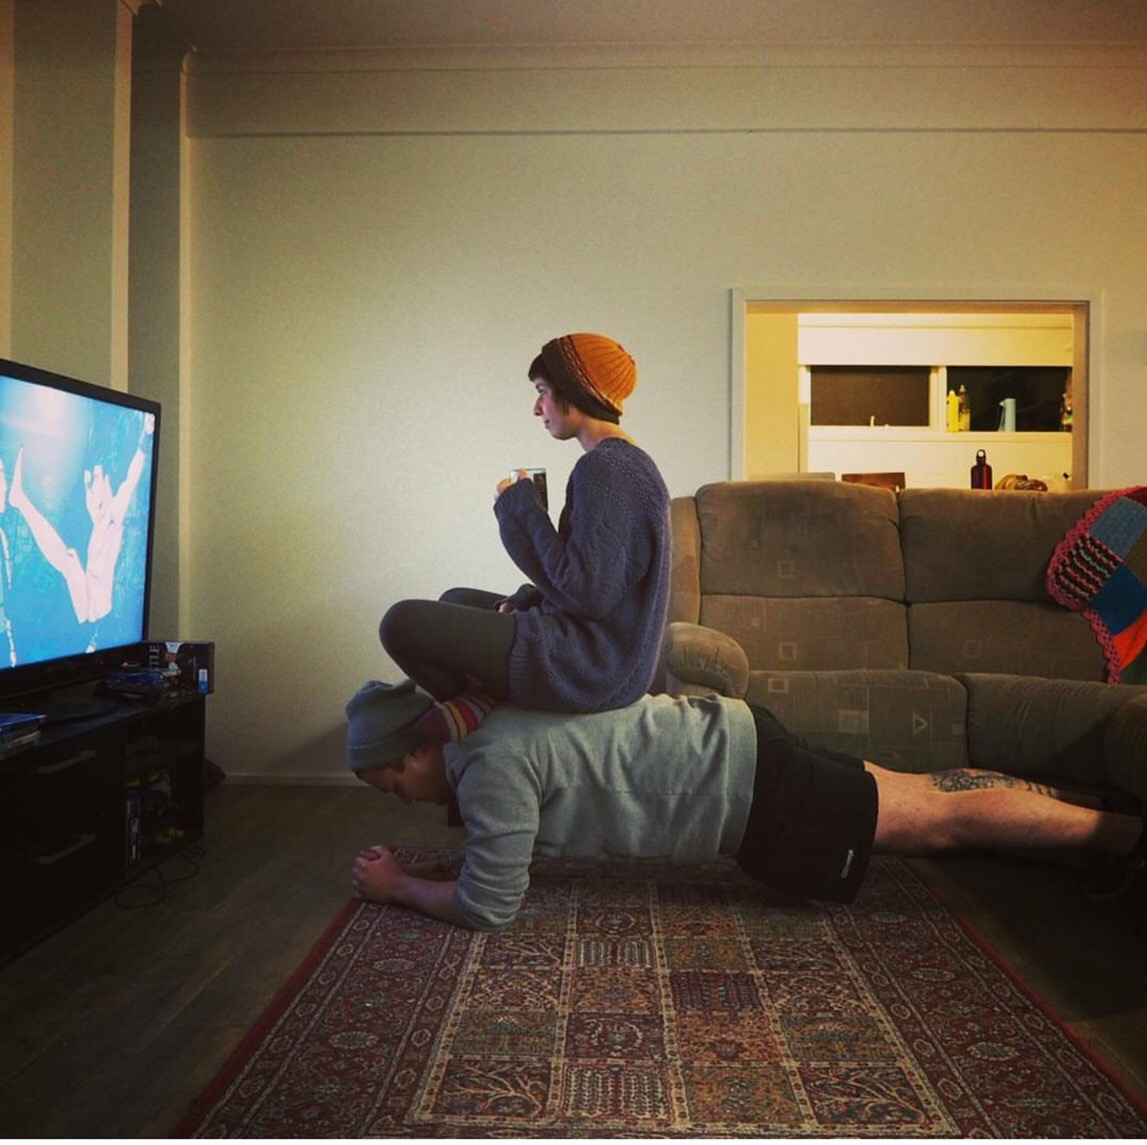 Partner pushups